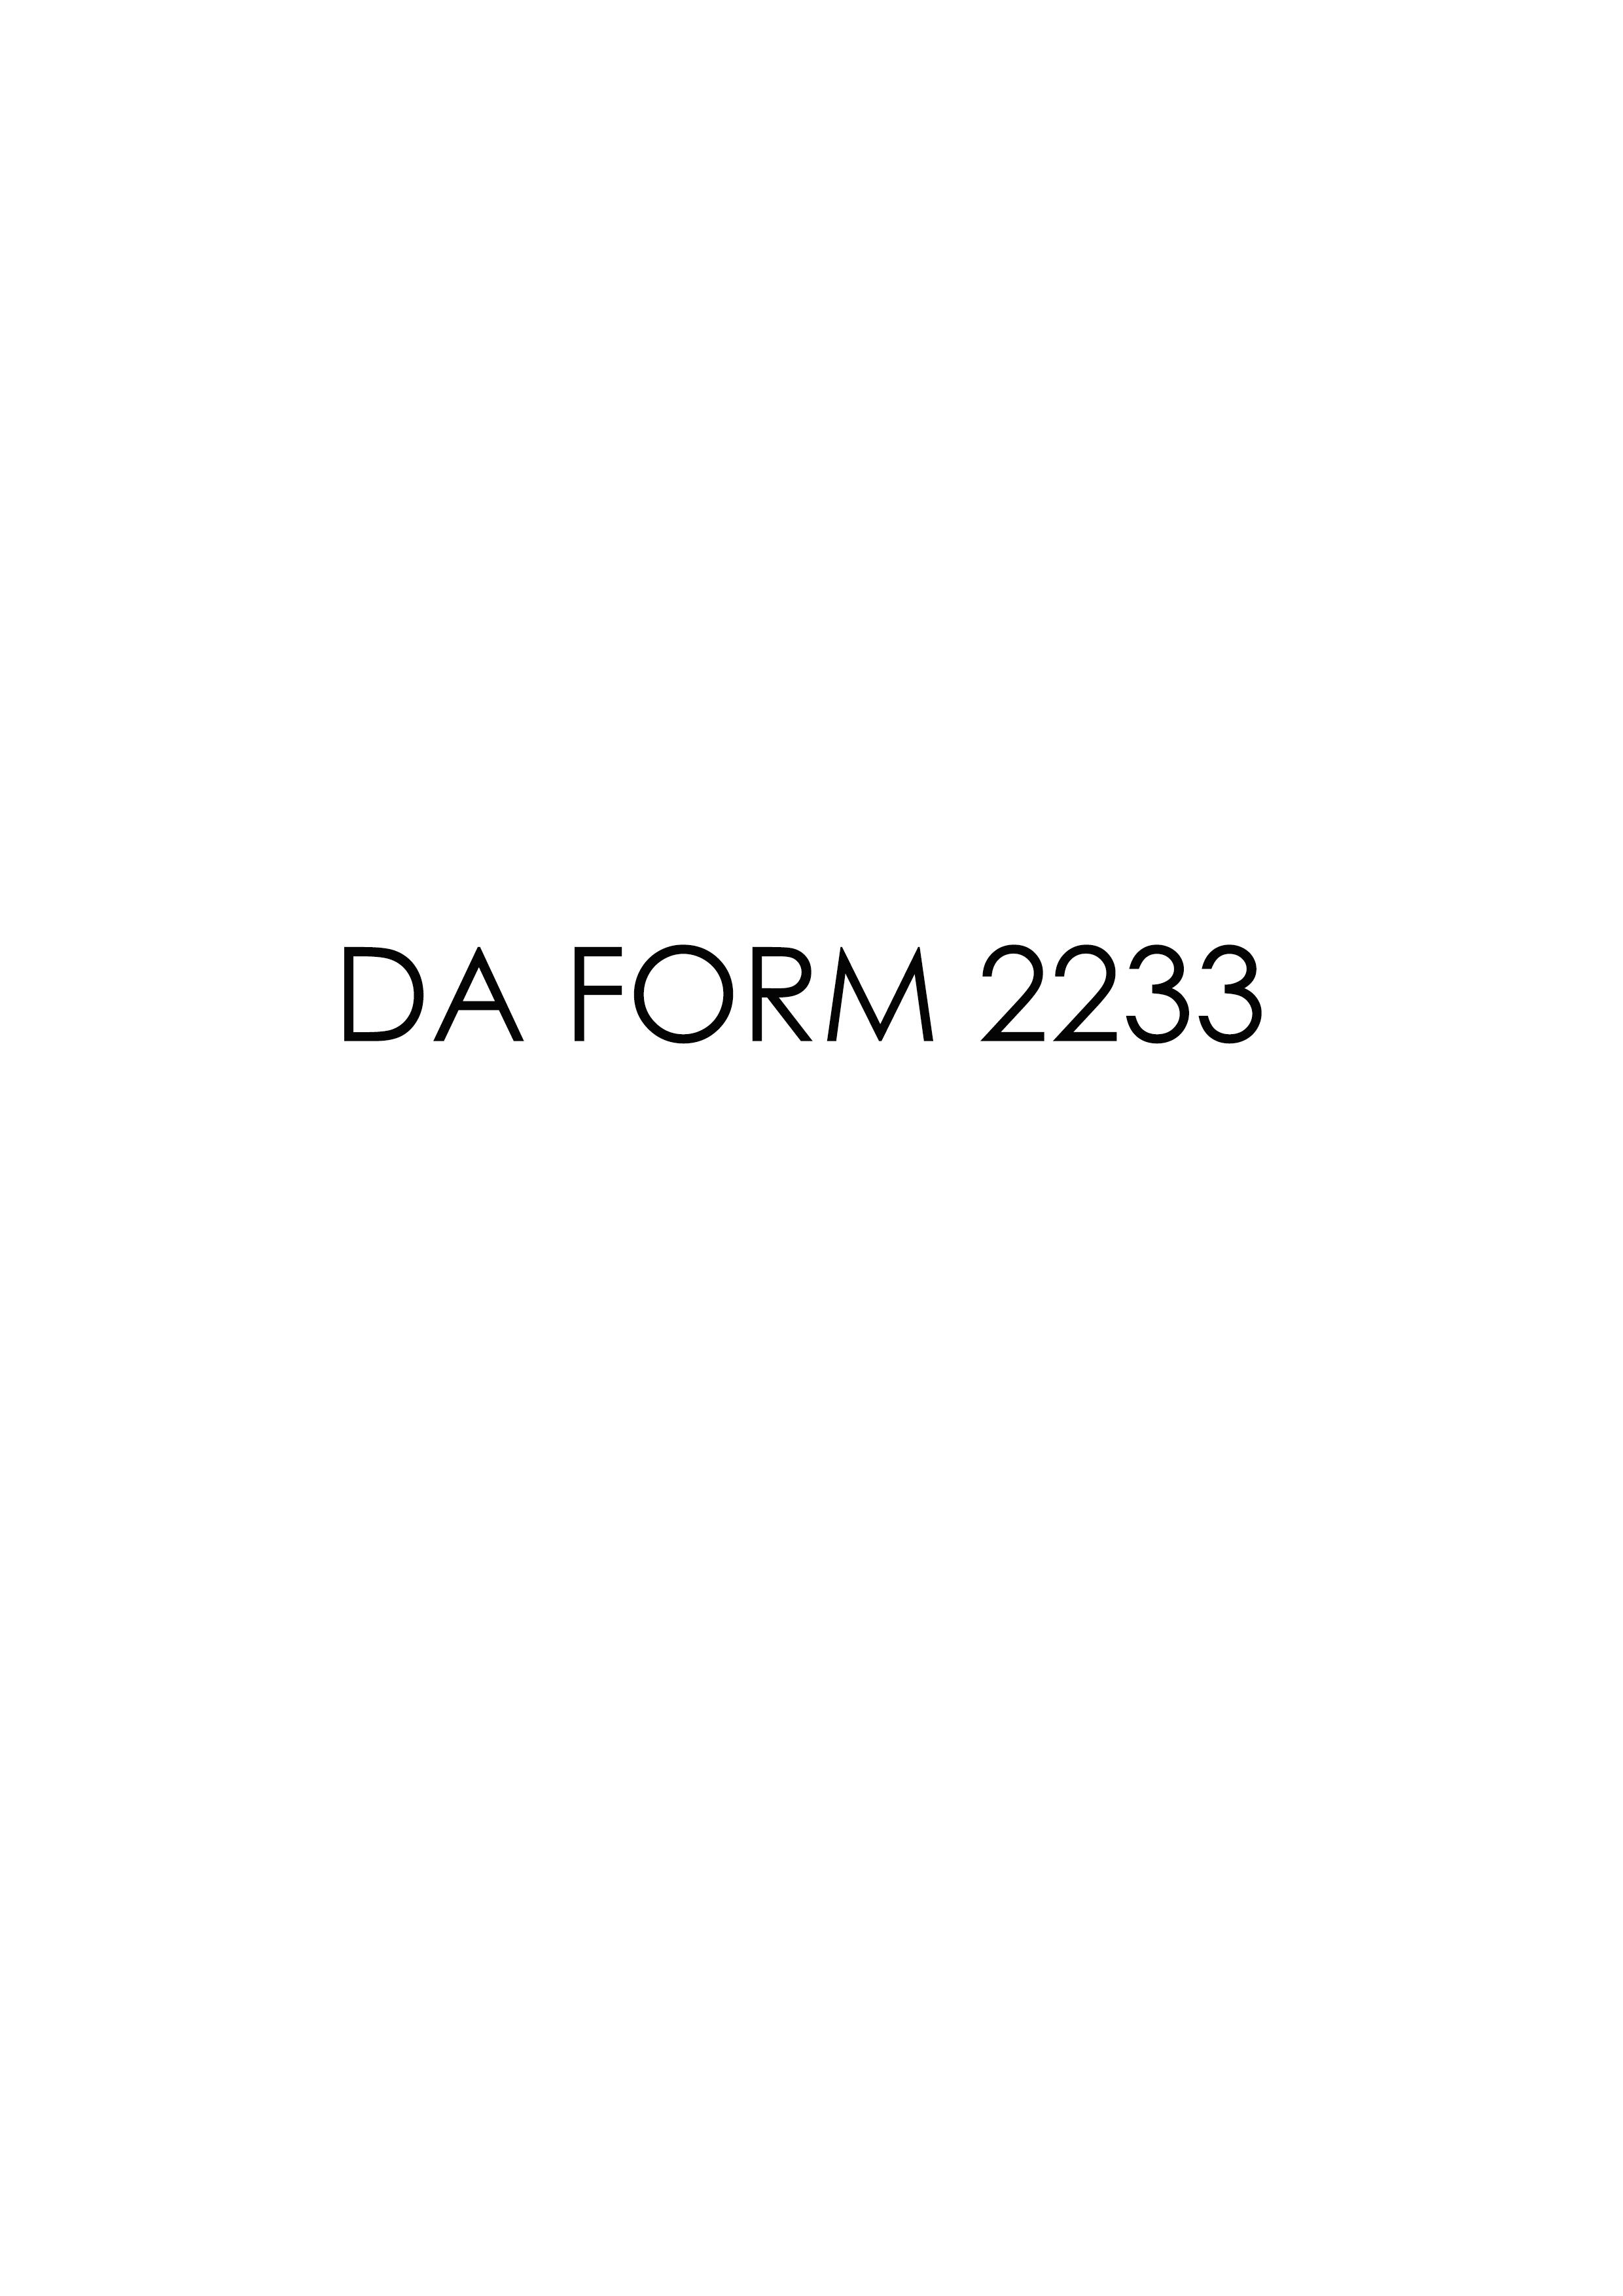 Download da Form 2233 Free